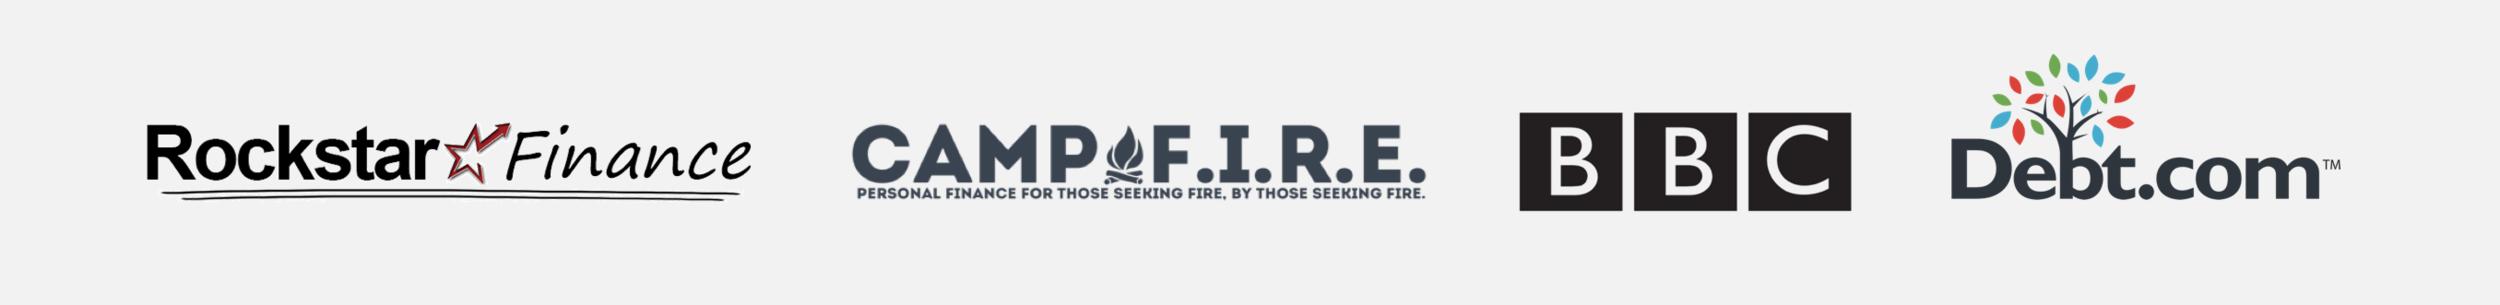 Featured on Rockstar Finance, Campfire Finance, BBC, and Debt.com